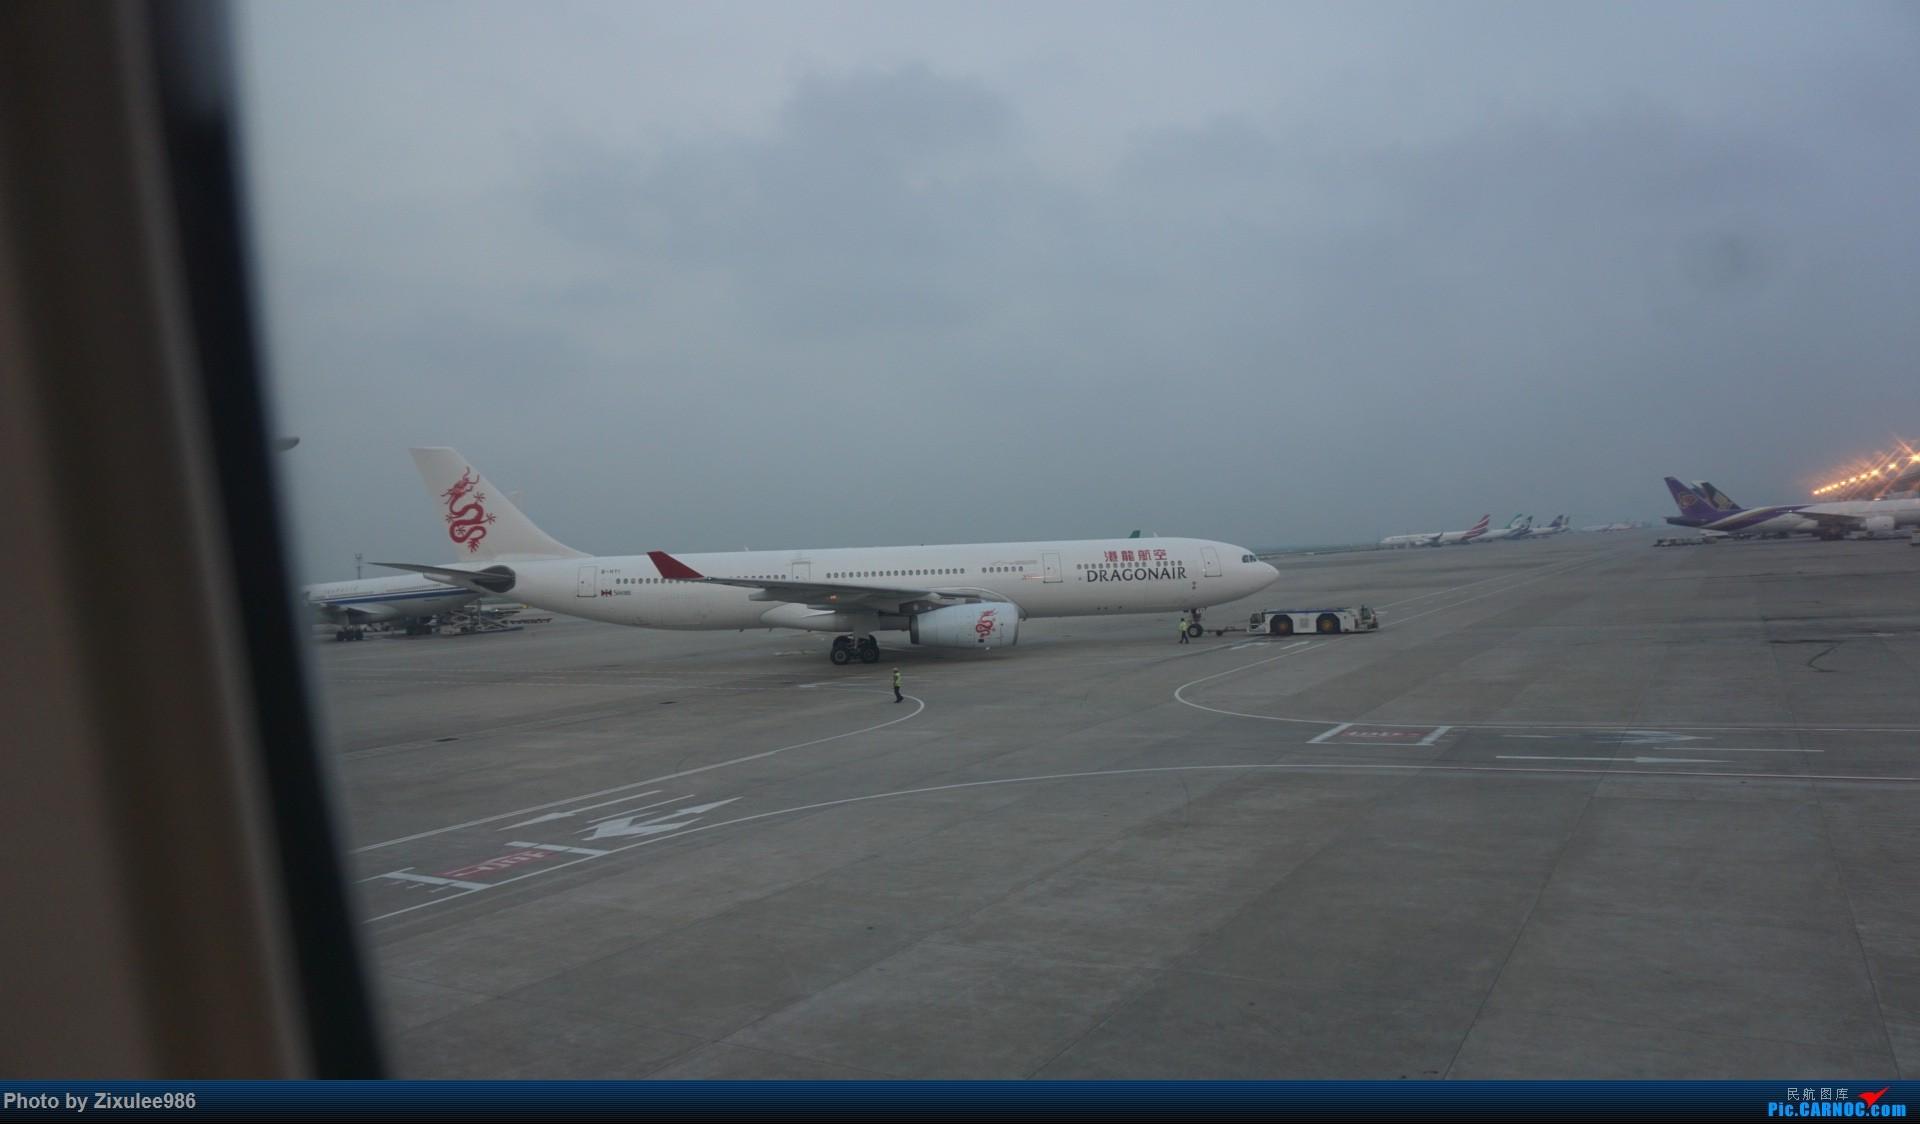 Re:[原创]加拿大21日游学之旅 (二)~加航AC28..PVG-YYZ到达多村后的雨天~多图缓更,请各位大侠谅解~ AIRBUS A330-343X B-HYI 中国上海浦东国际机场